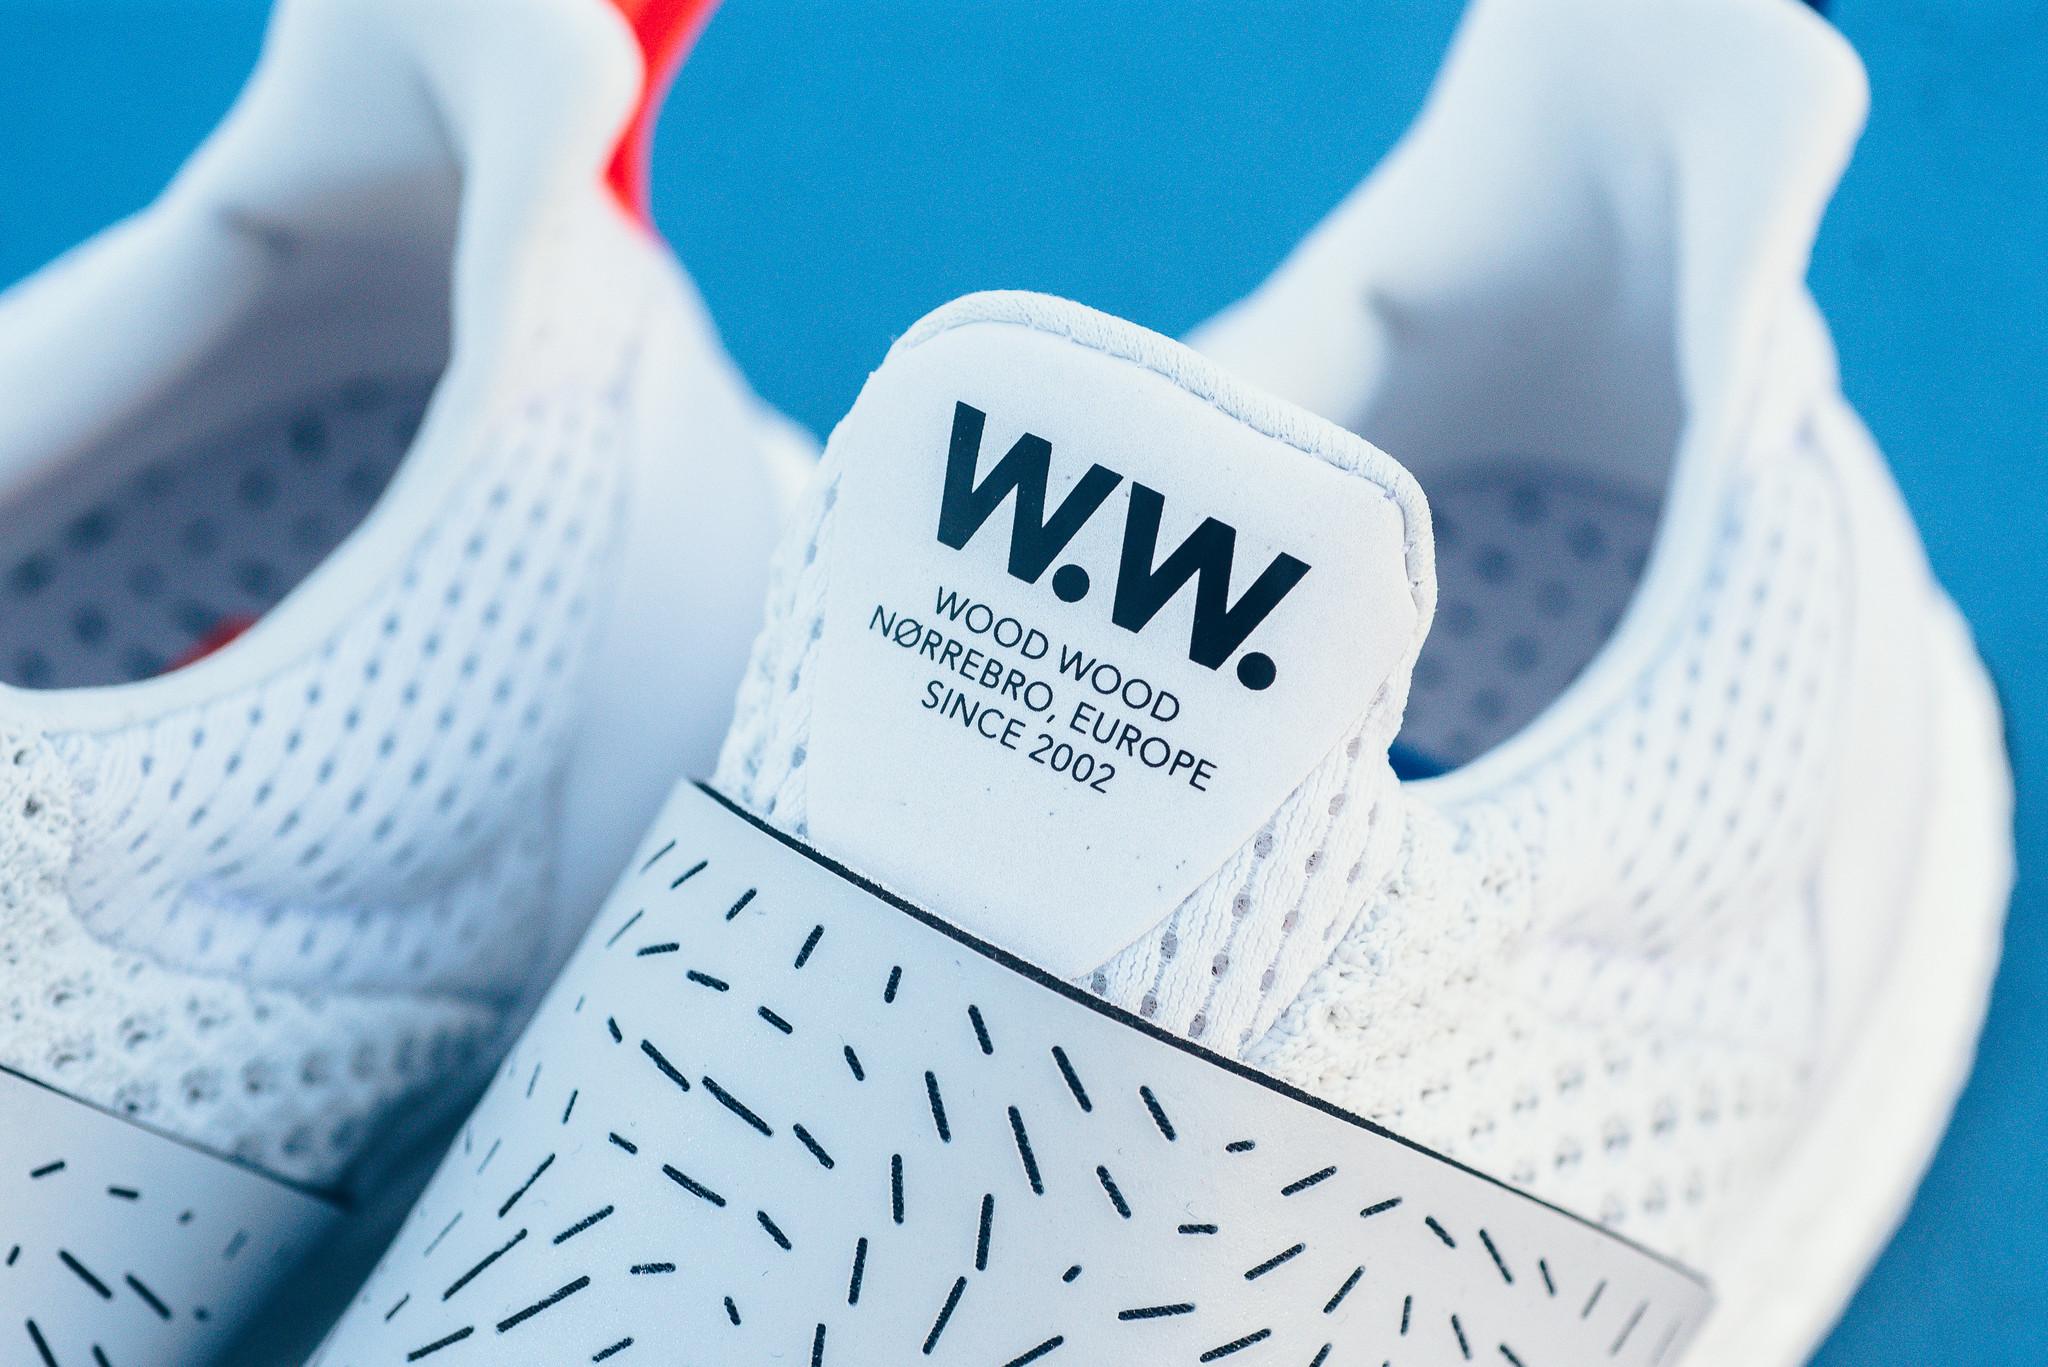 Adidas_x_Wood_Wood_Ultra_Boost_Smealer_Politics_Hypebeast_11